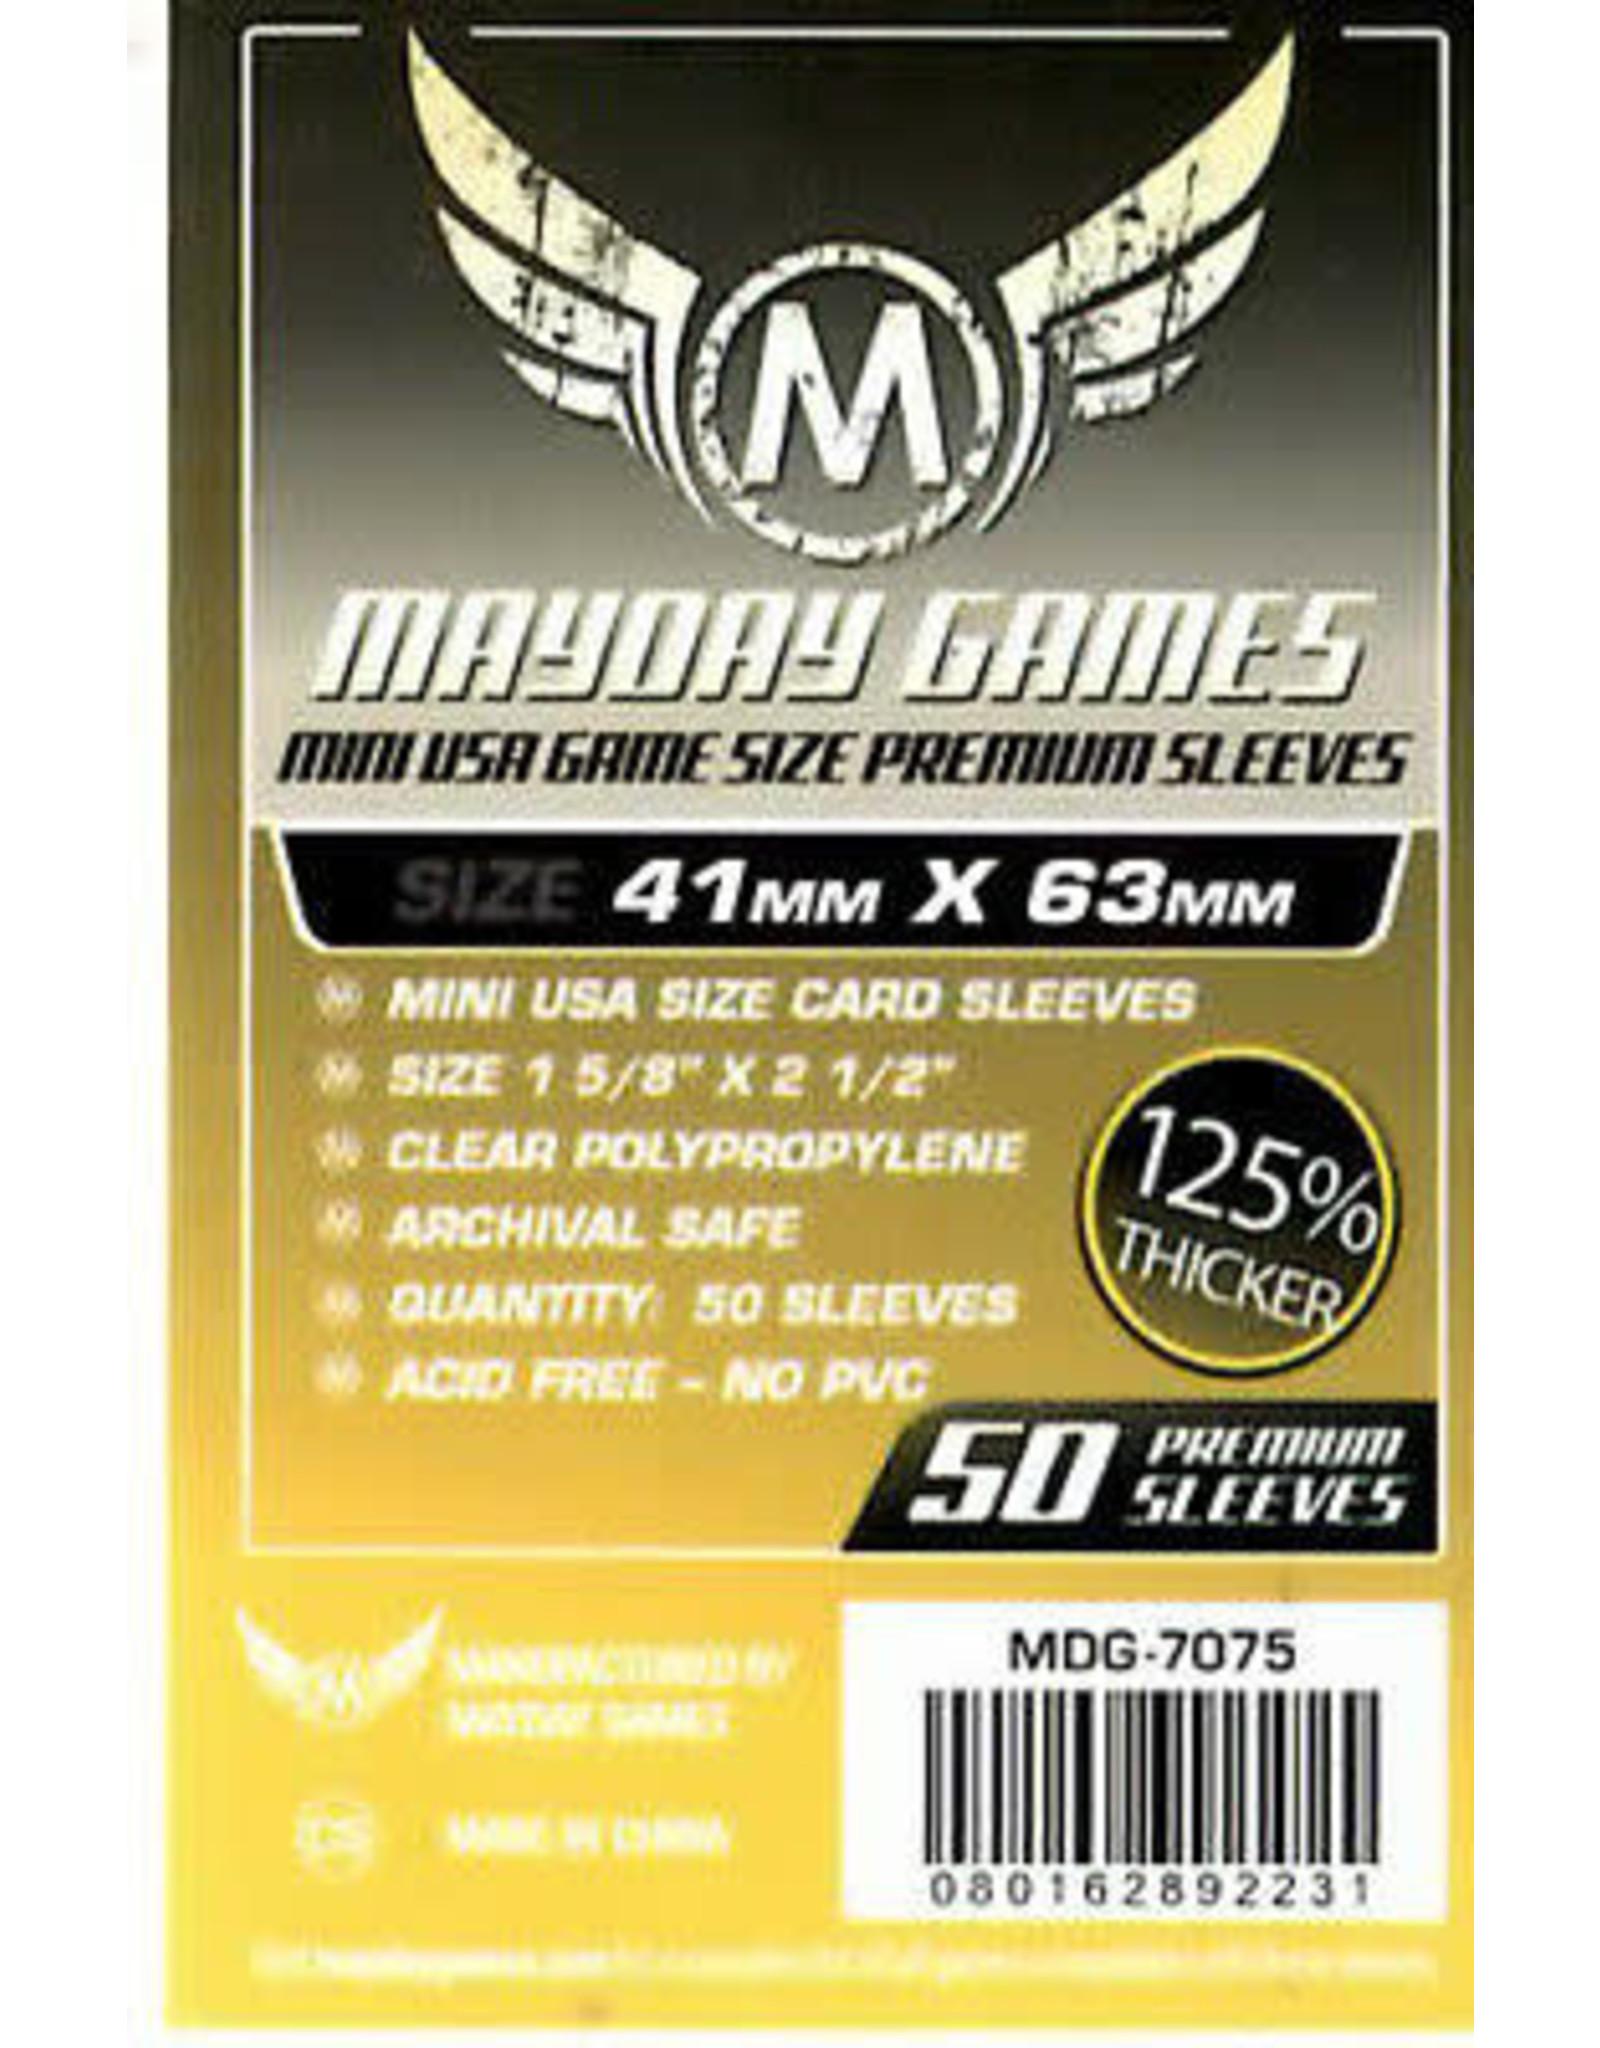 Mayday PREMIUM MINI USA SLEEVES 41MM X 63MM 50CT